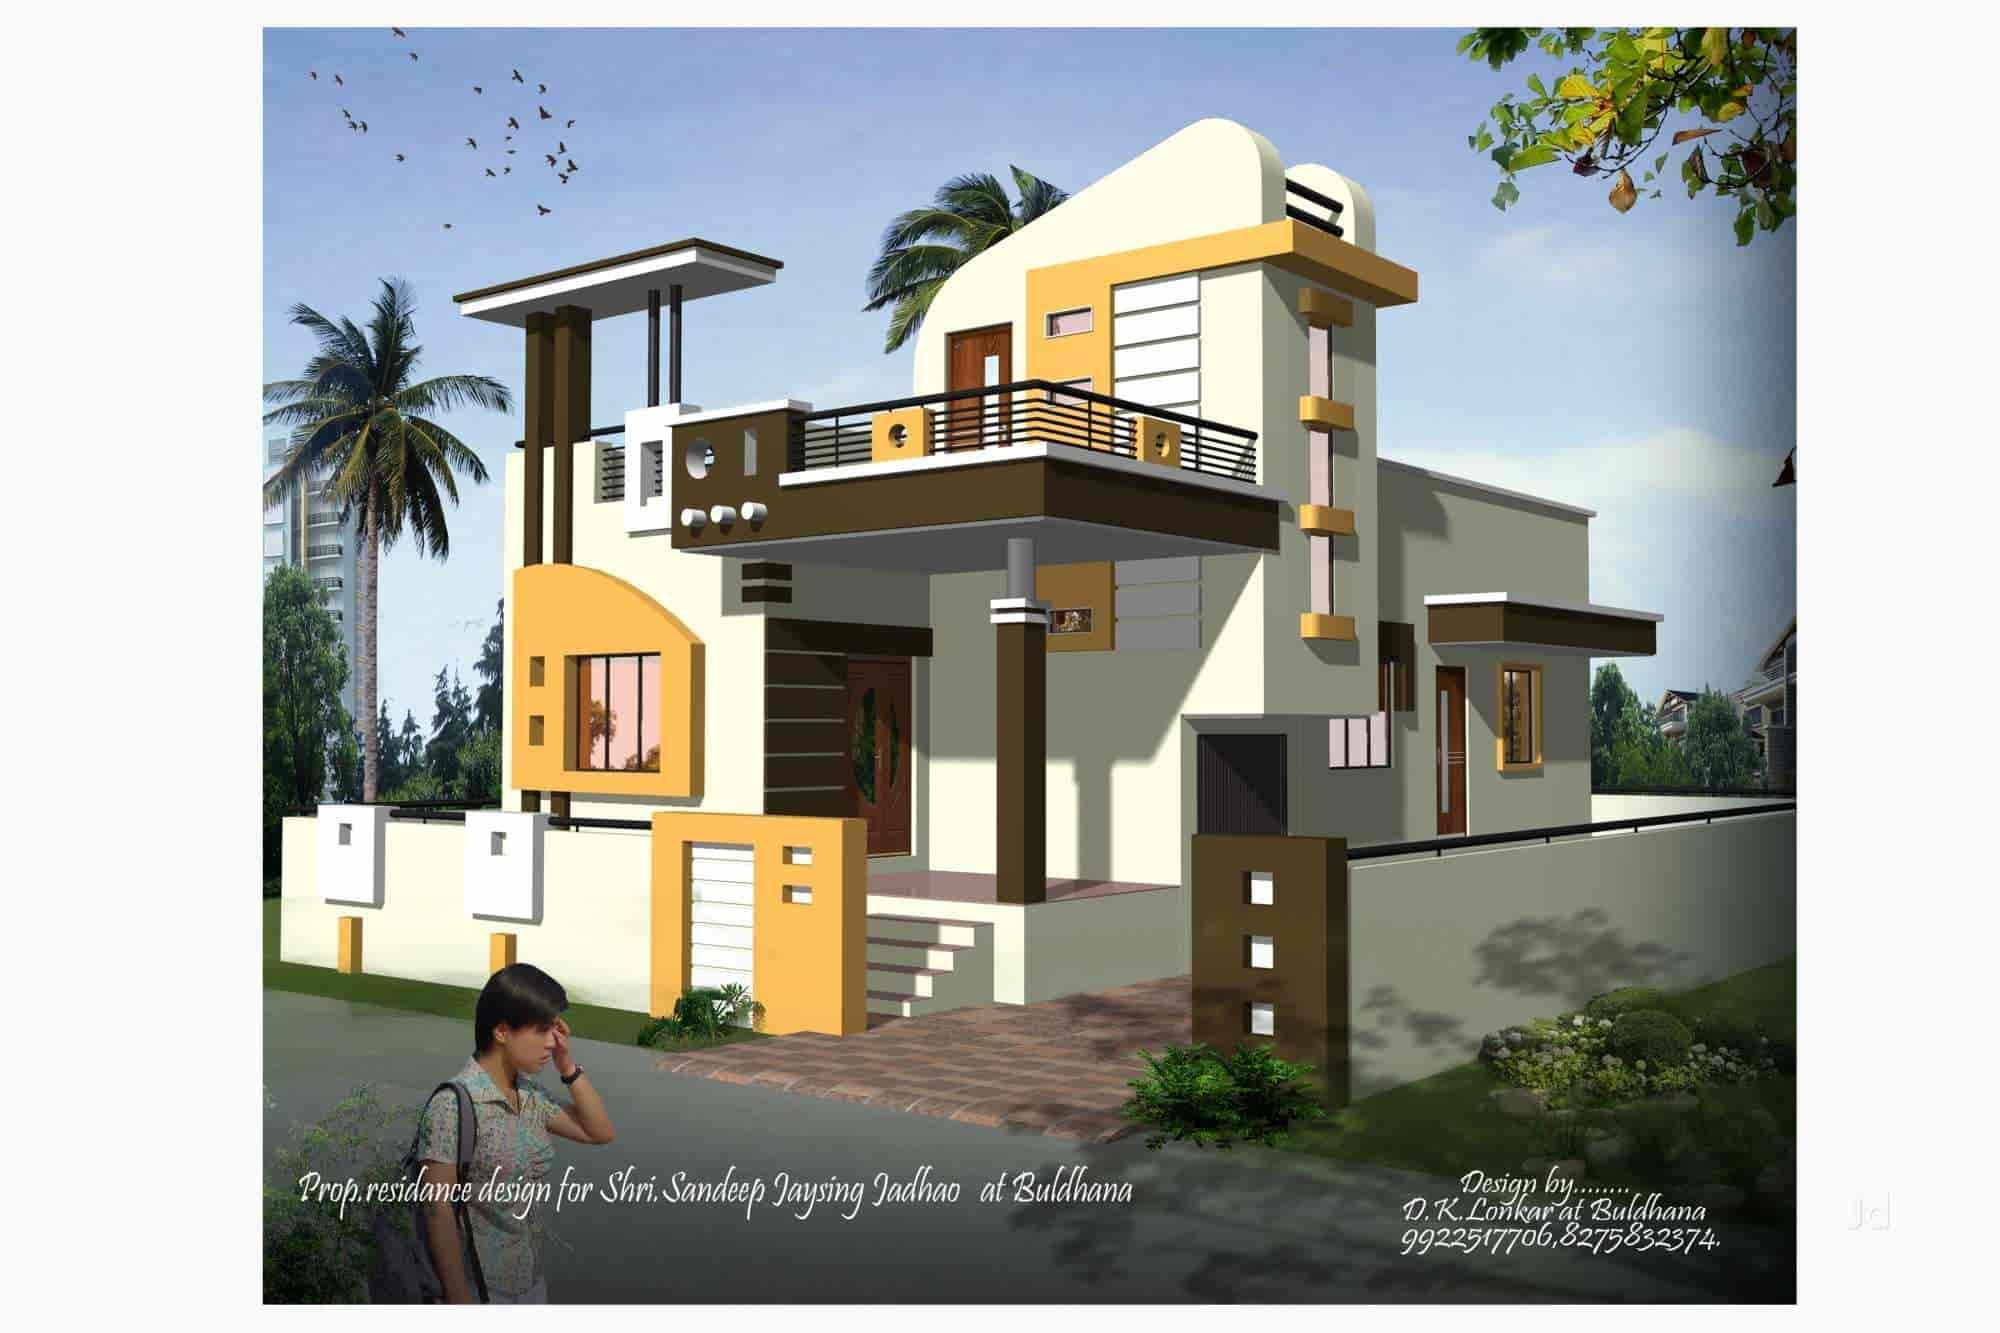 ... Architects Design   DK 3 D Home Design Photos, Buldana H O, Buldhana    Architects ...